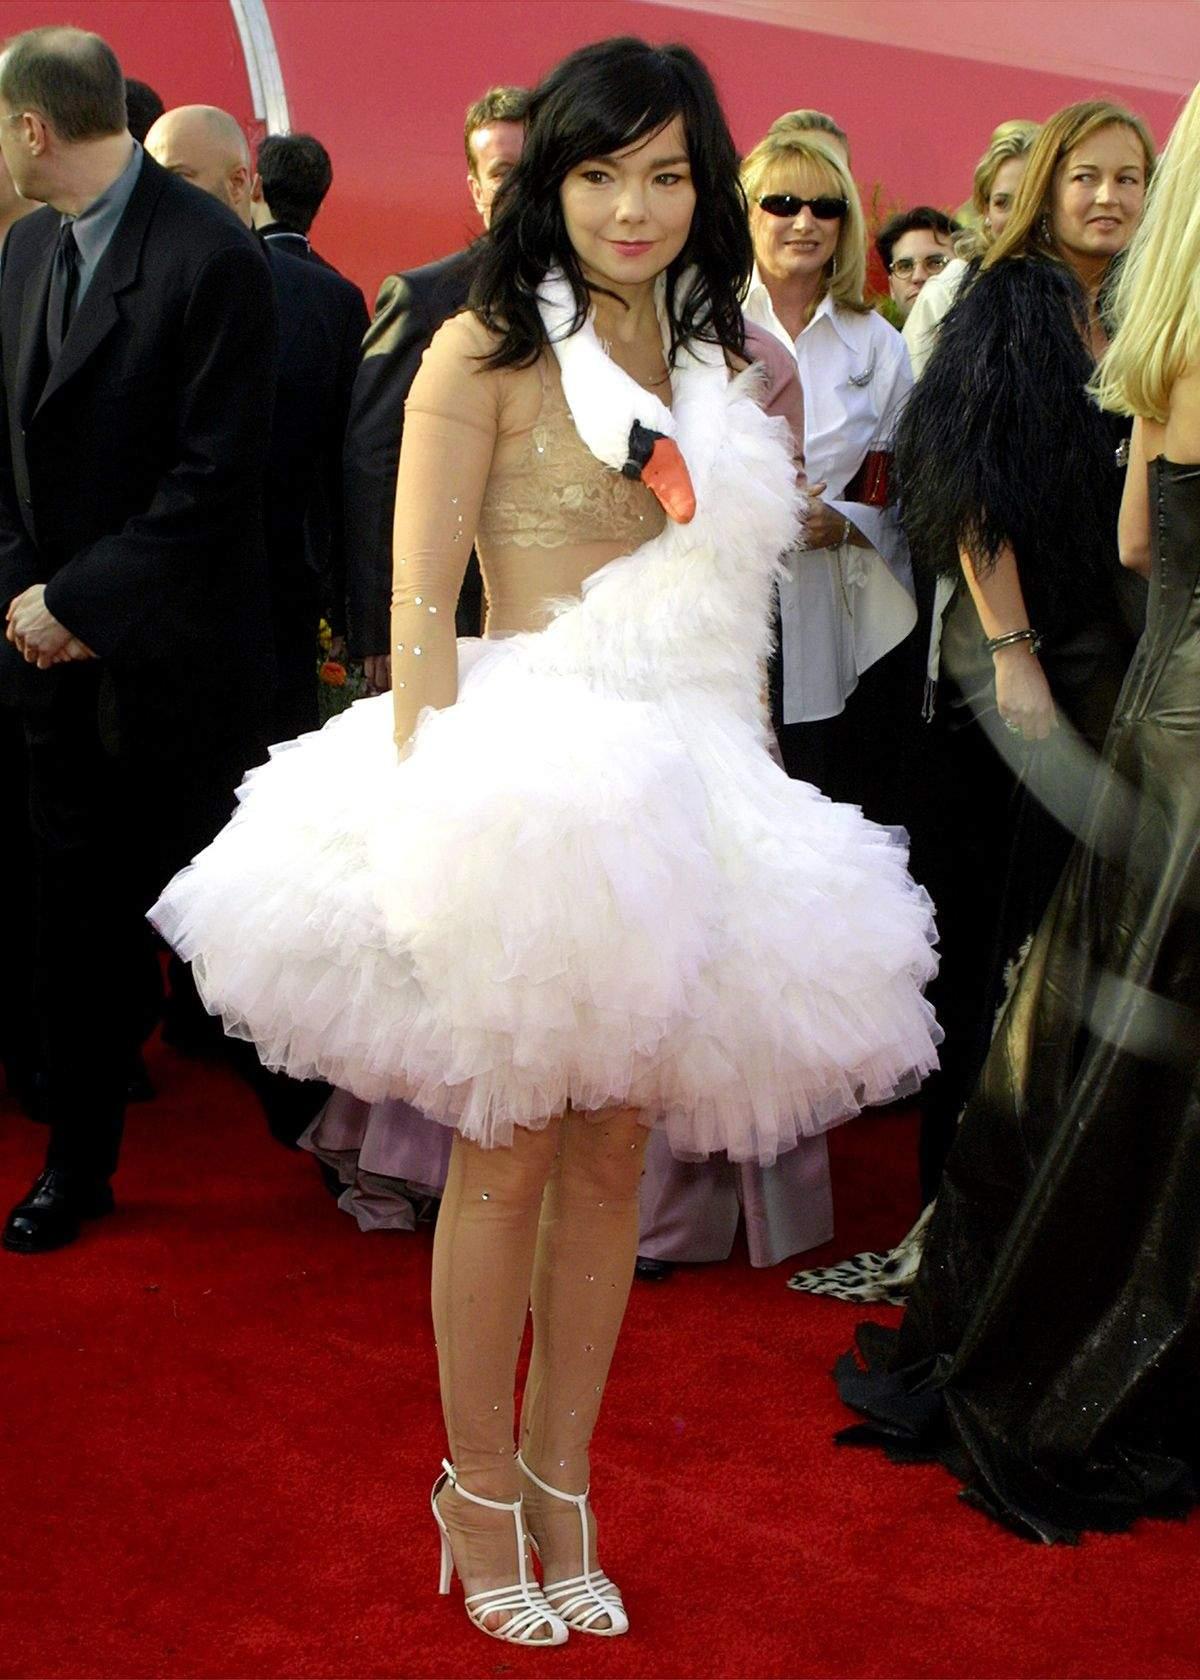 Bjork wearing a Swan dress for the Oscars